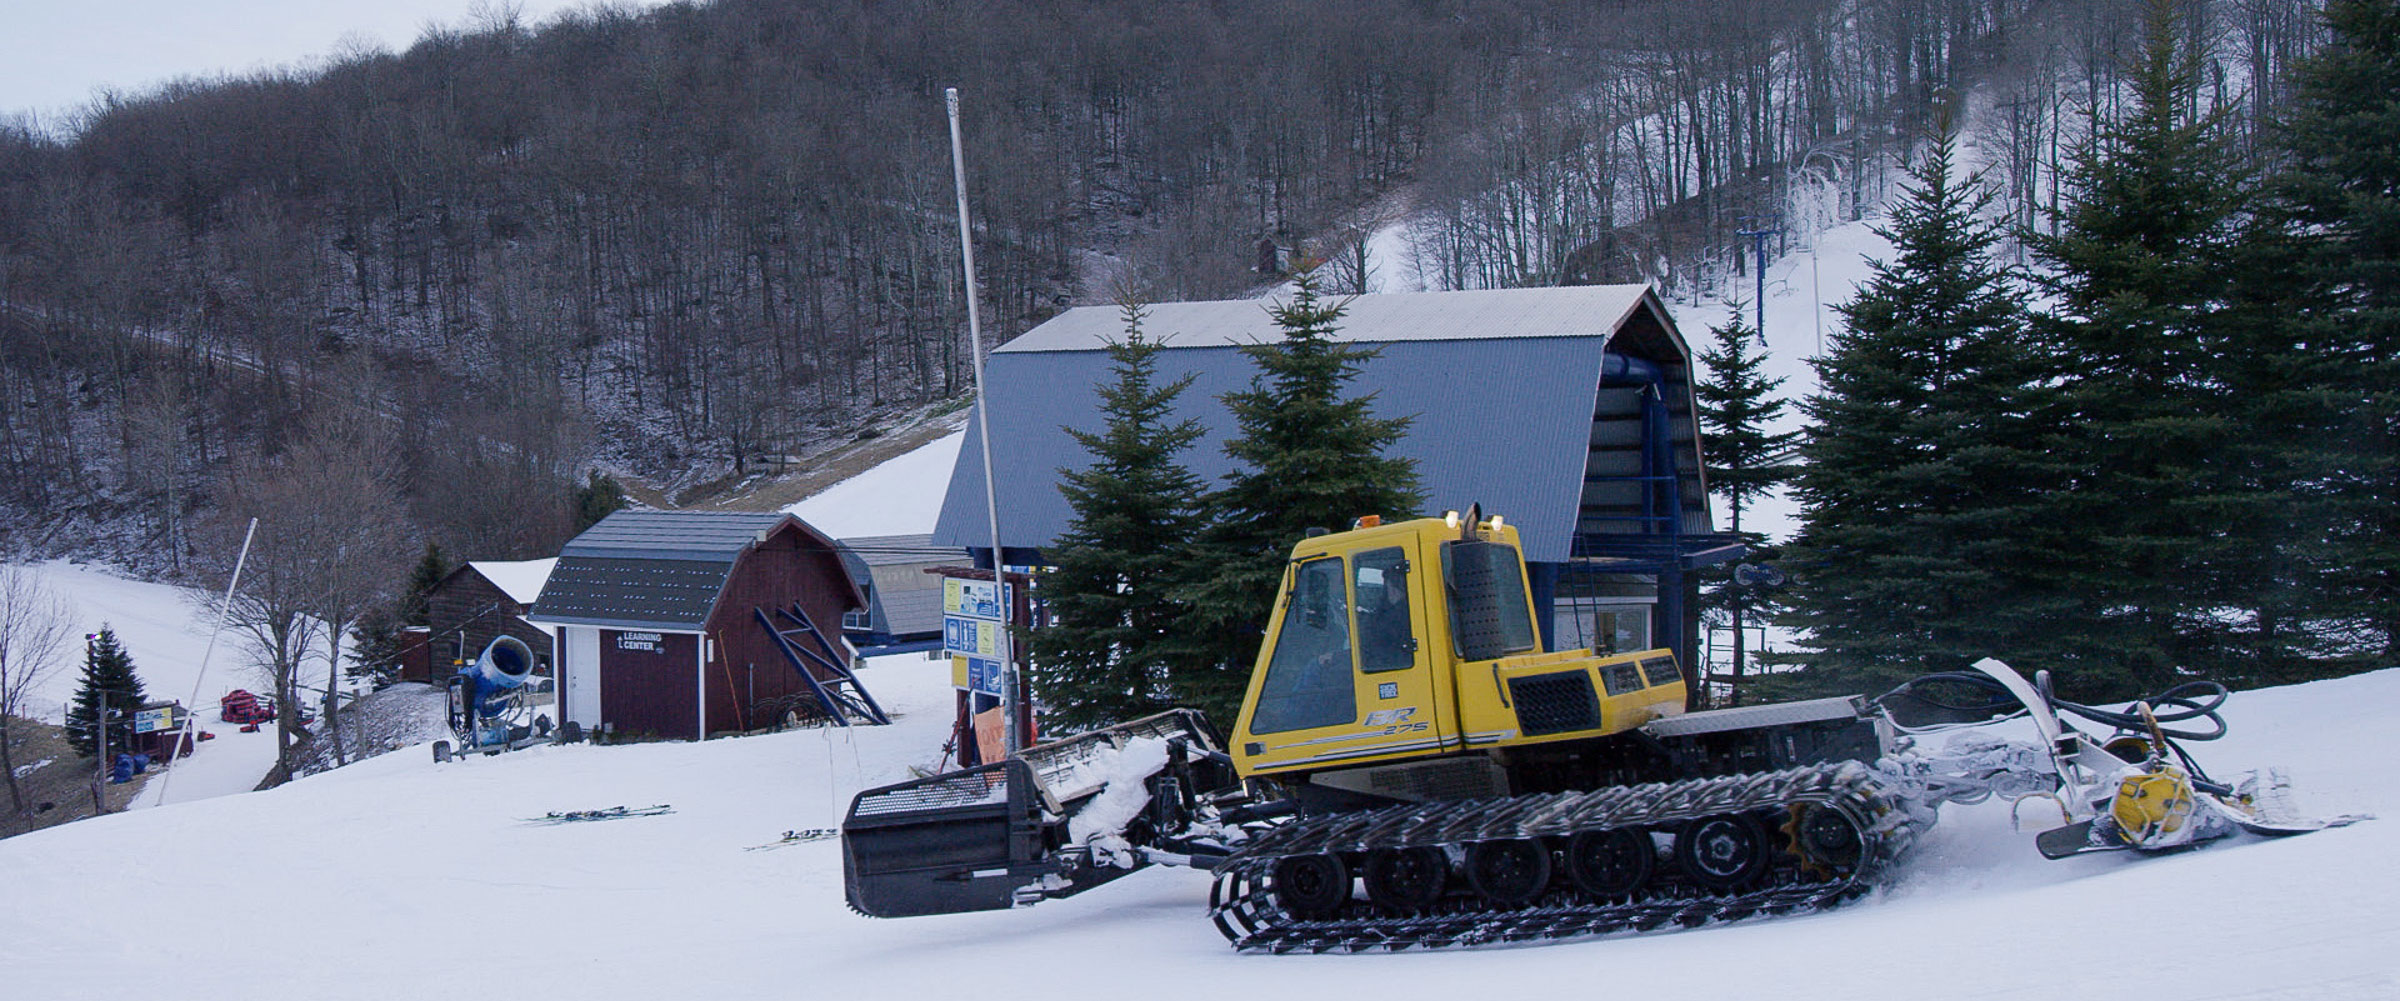 snowfarmers Plattekill Groomer 01